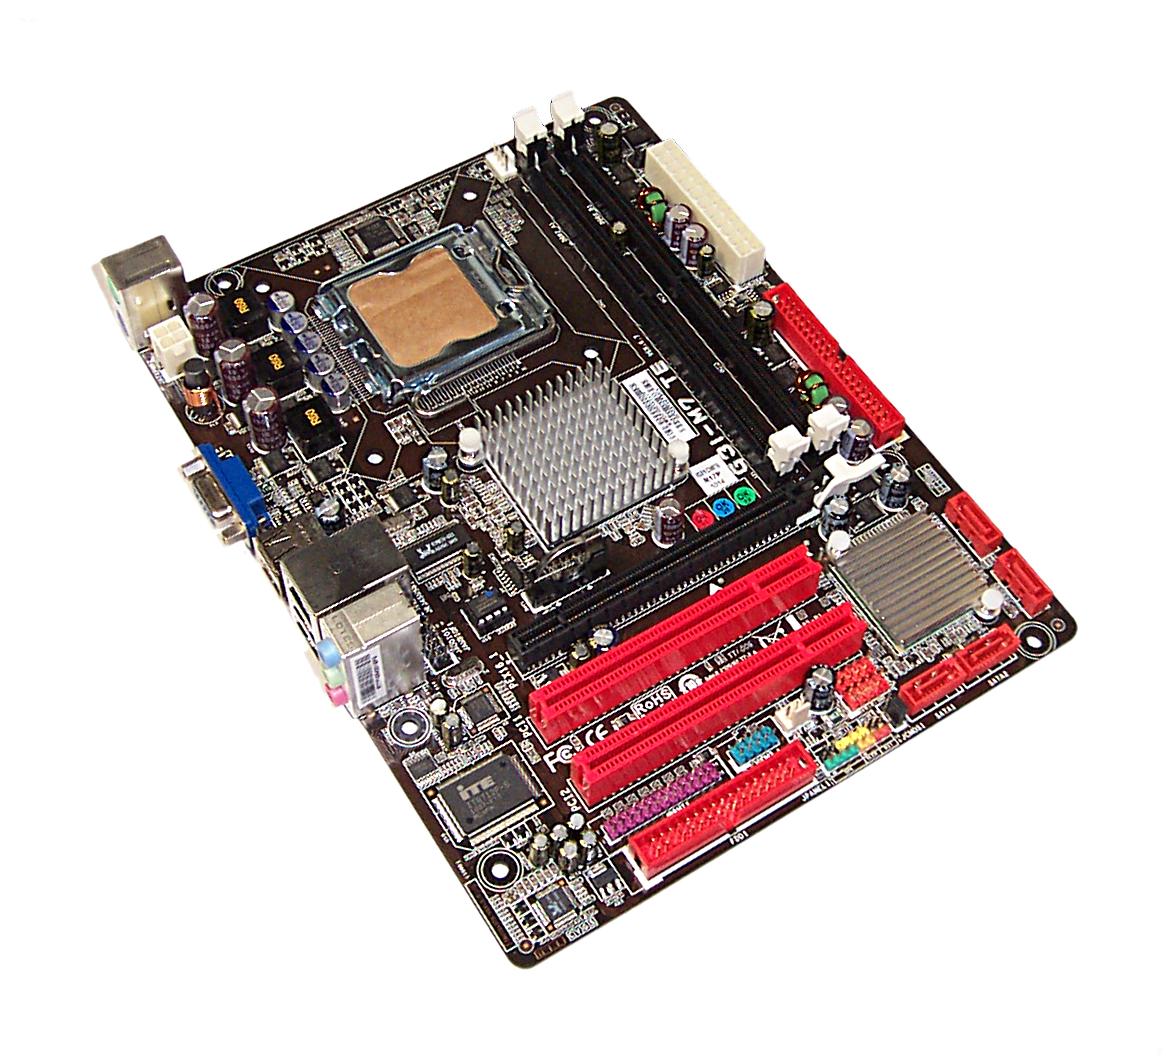 Biostar G31-M7 TE VER:6.7 Socket T (LGA 775) microATX Motherboard